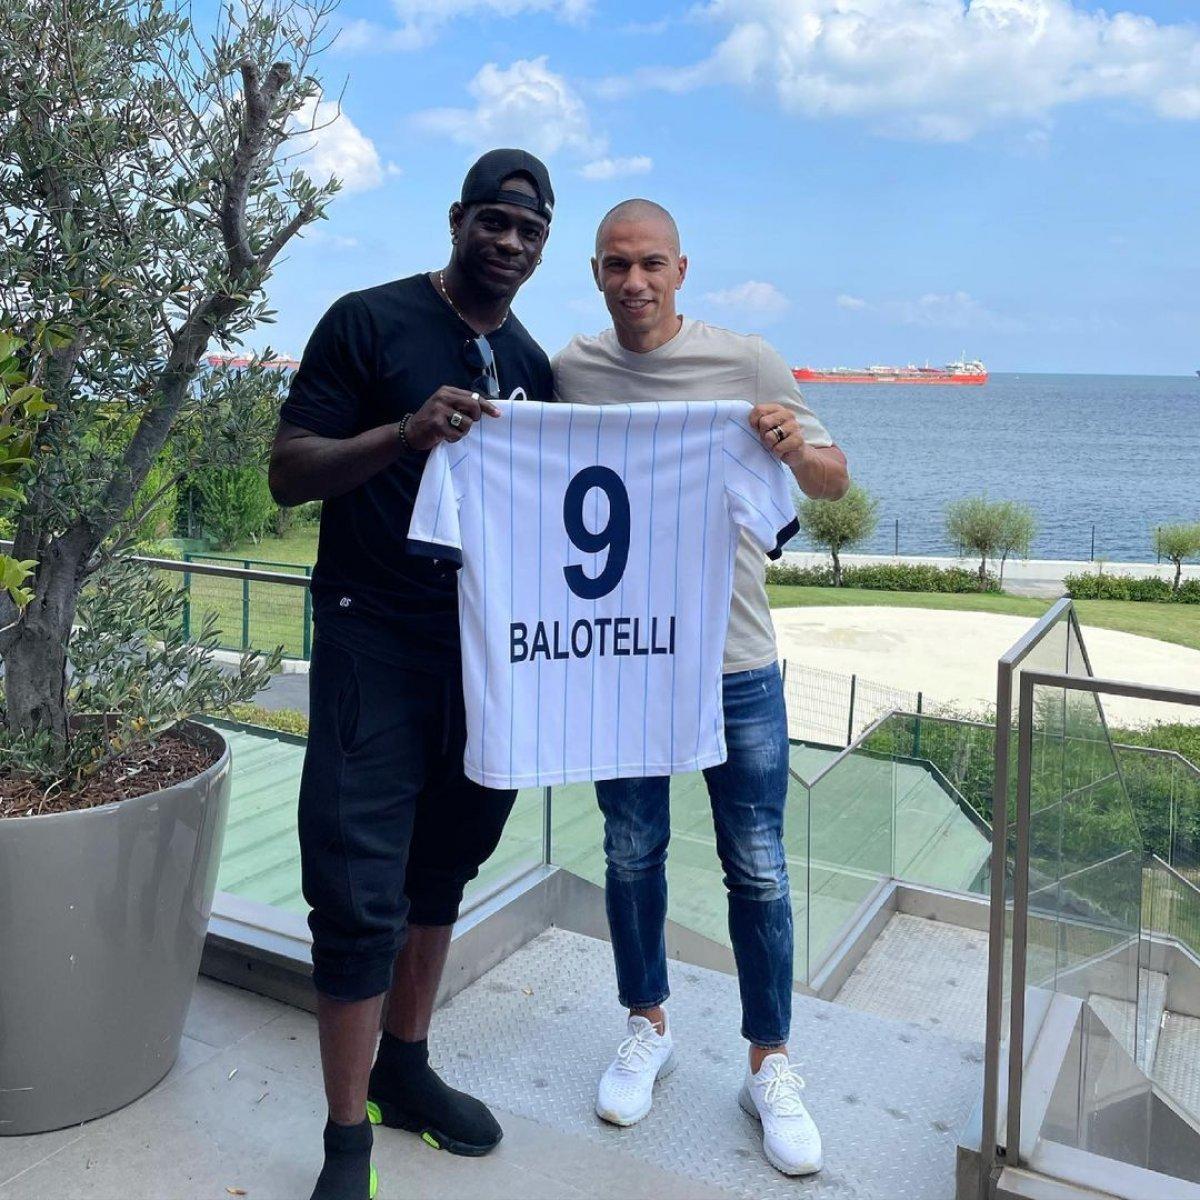 Balotelli den  semt oturuşu  #1